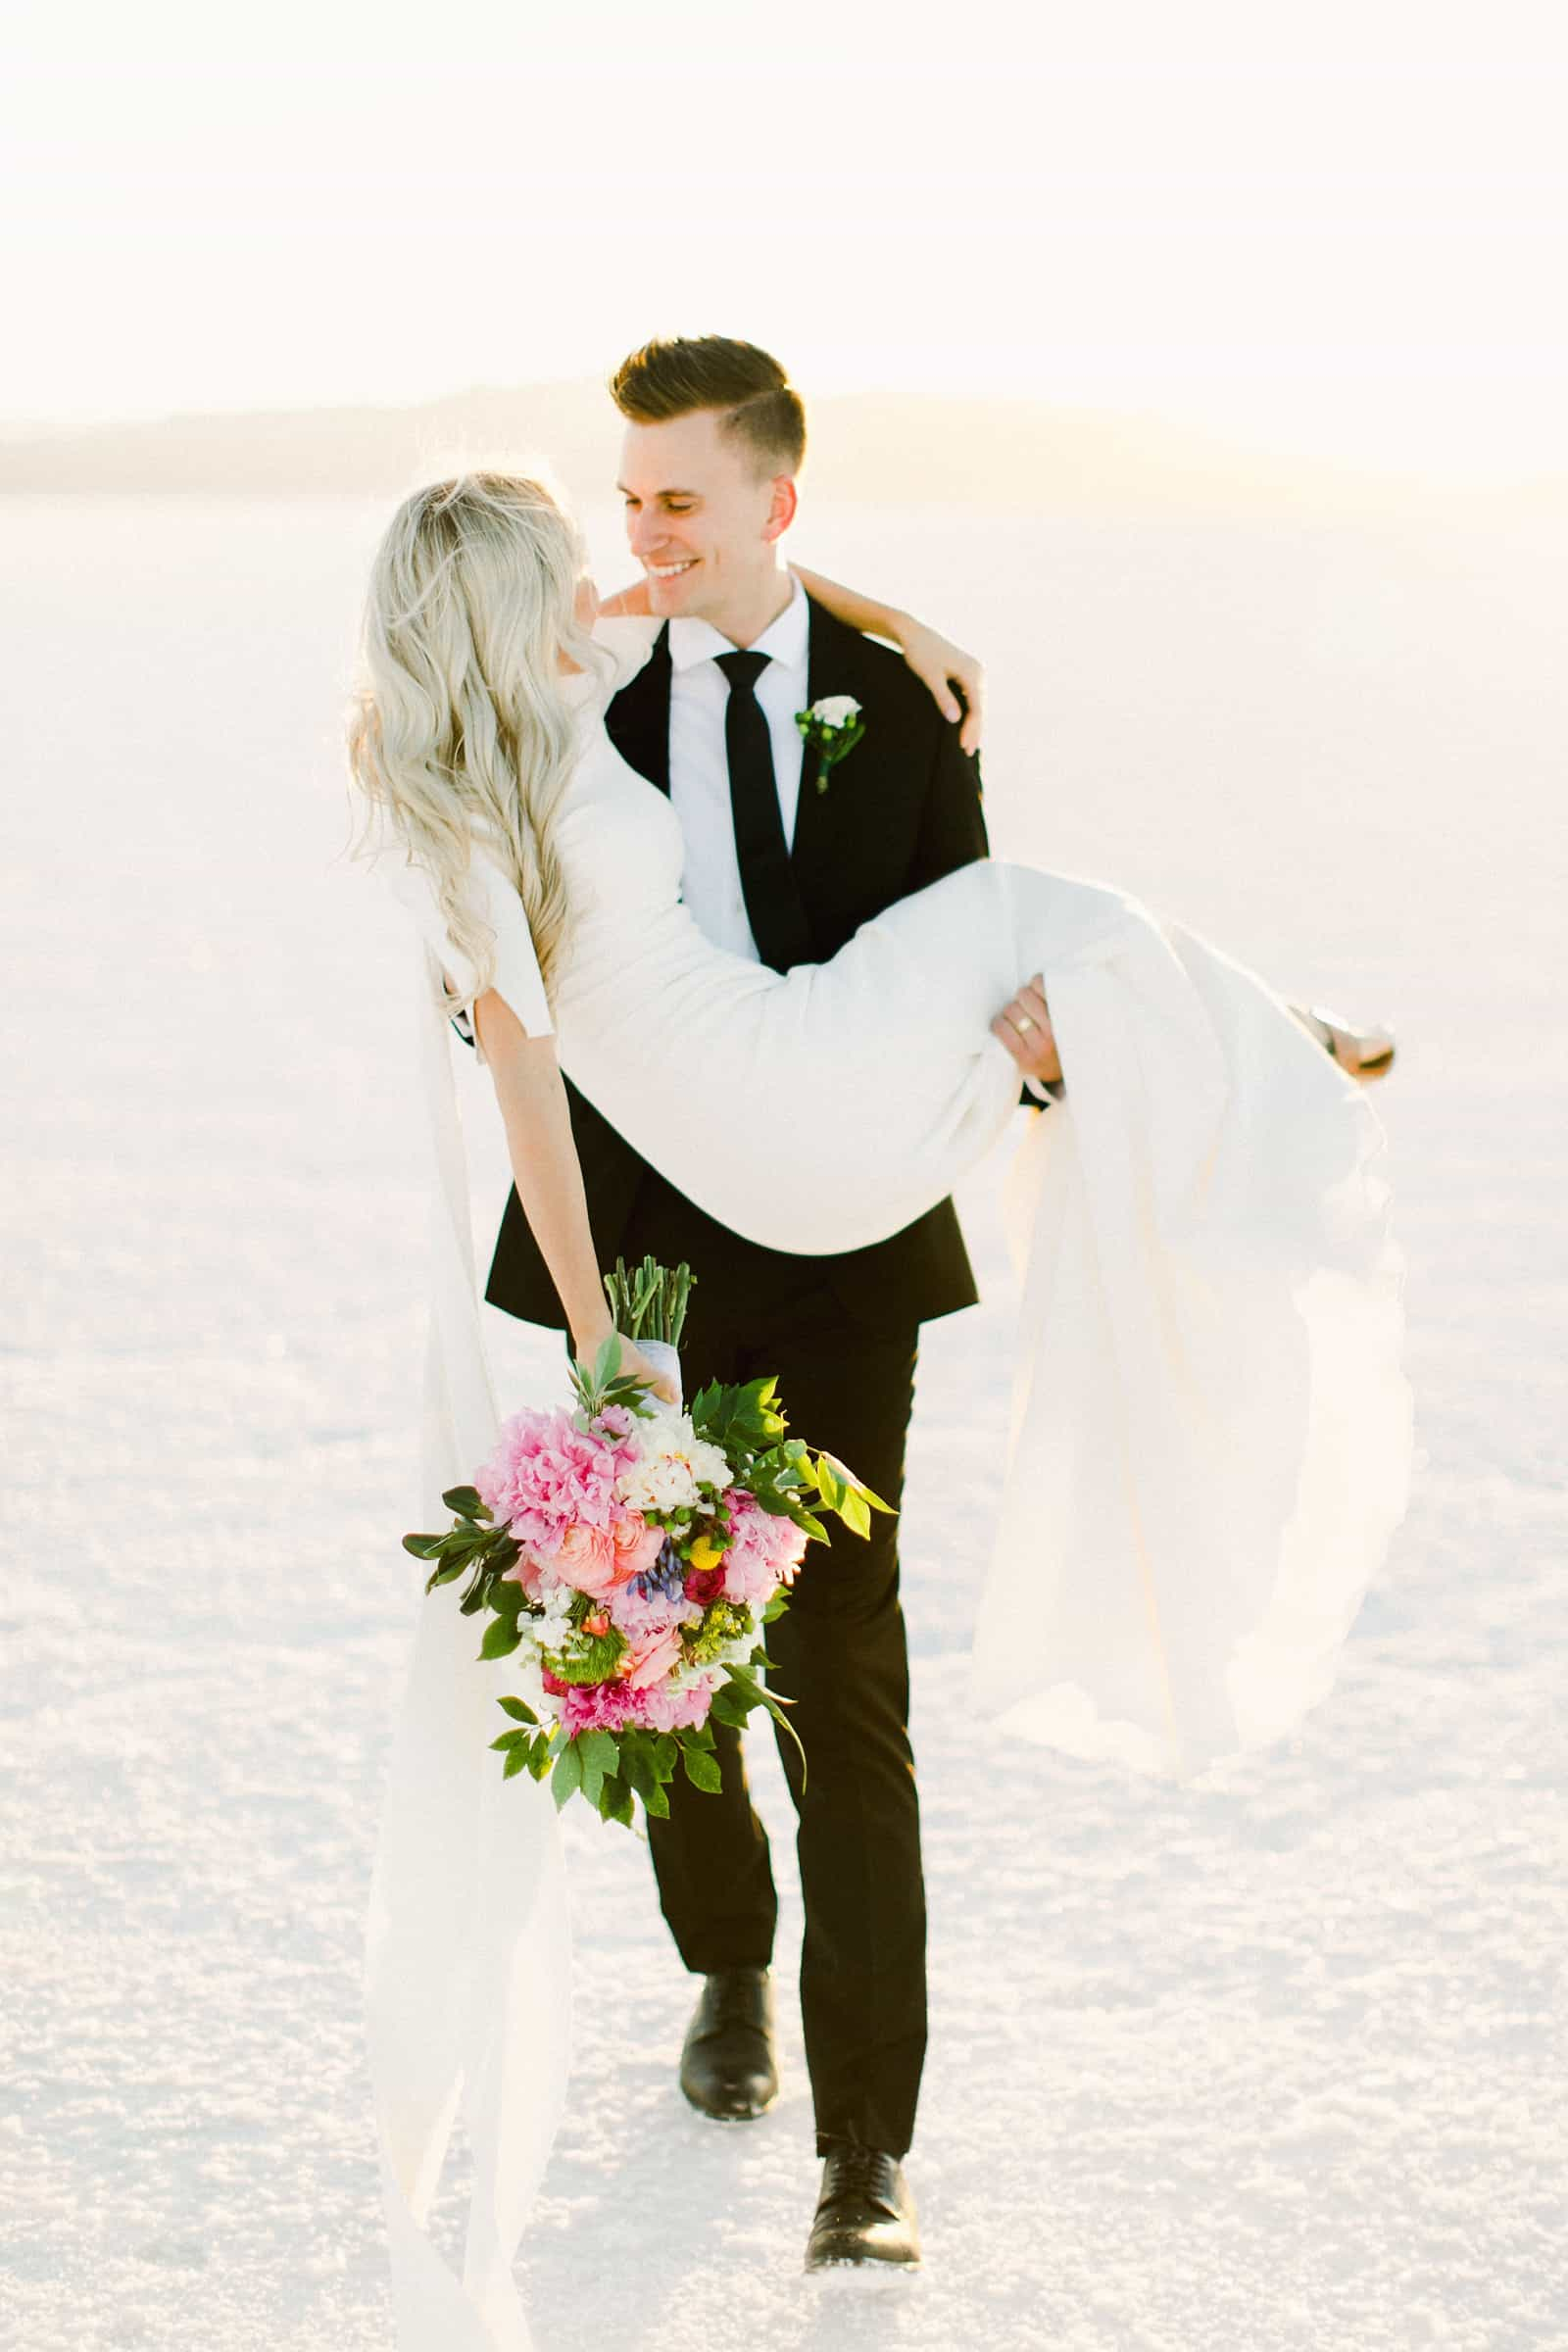 Bonneville Salt Flats Utah Wedding Photography, destination wedding, modern bride and groom golden sunset light